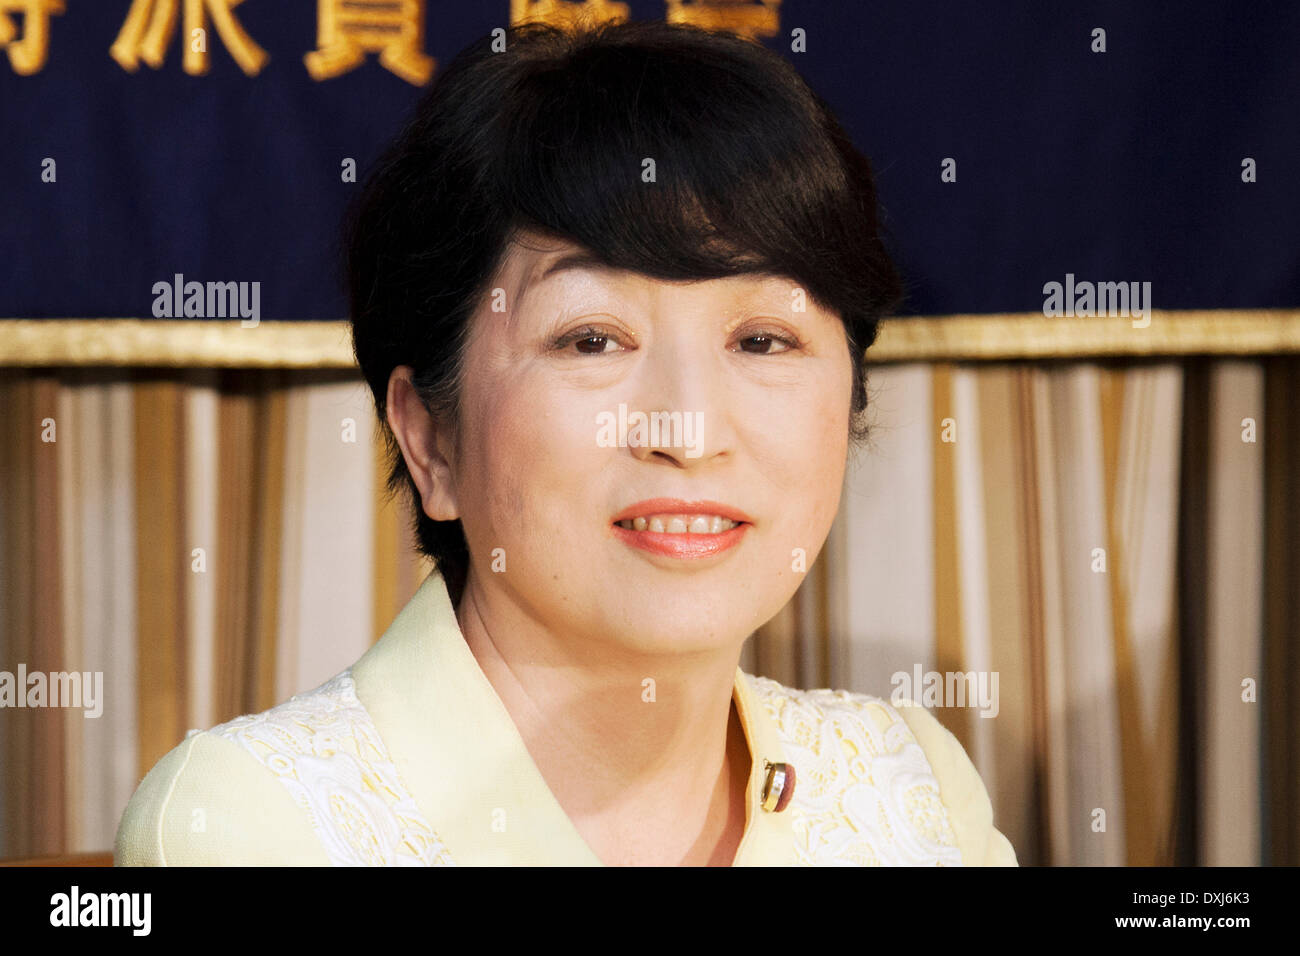 Download preview image - tokyo-japan-mizuho-fukushima-member-of-the-social-democratic-party-DXJ6K3